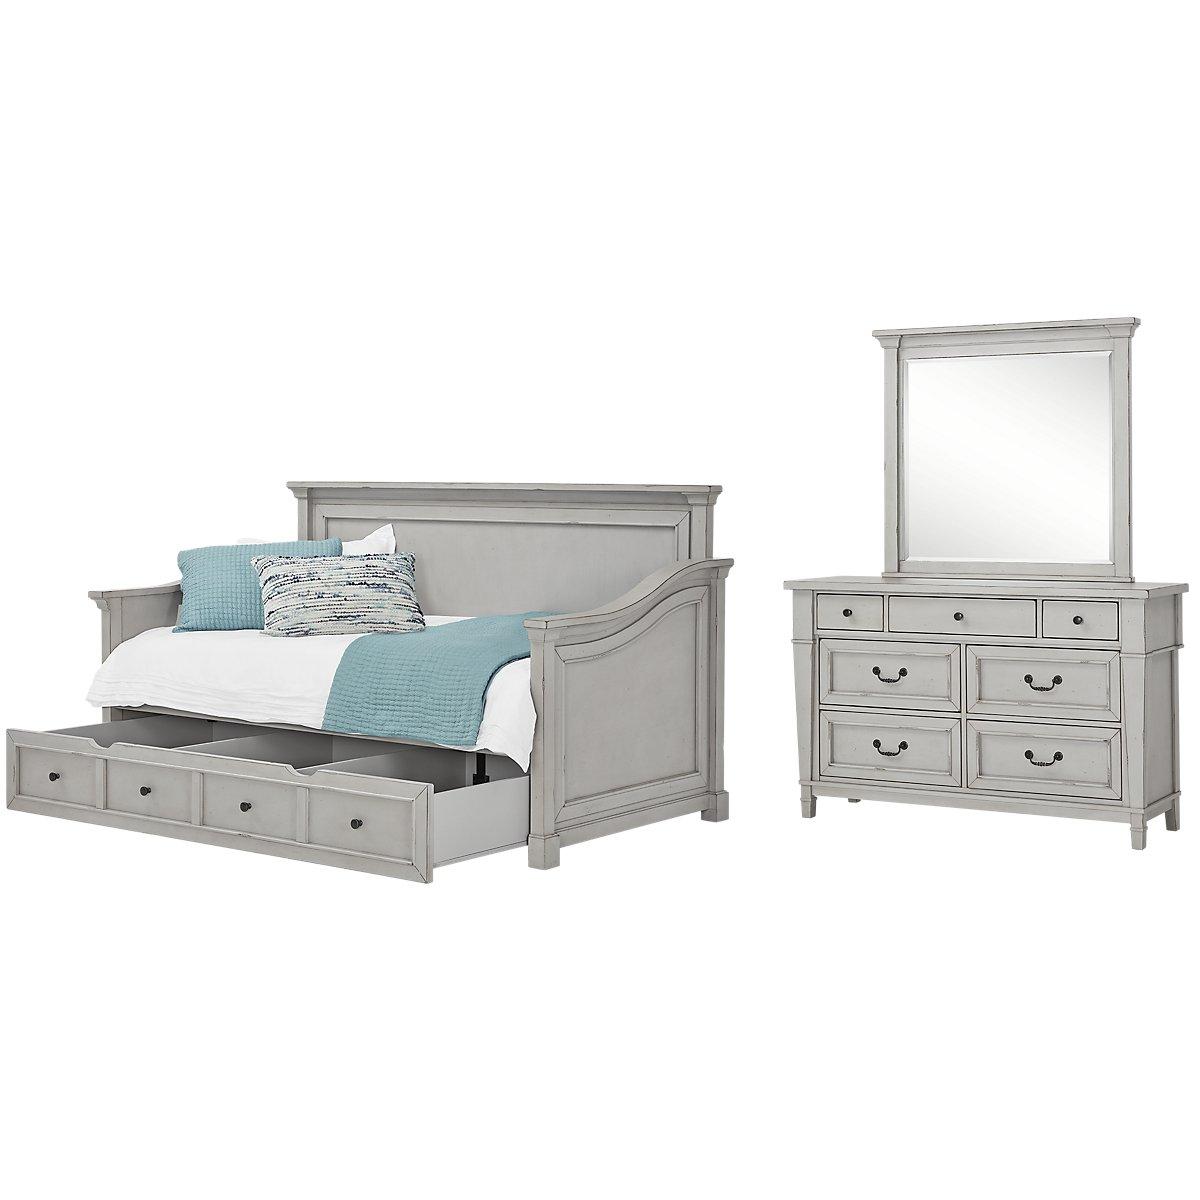 Stoney Gray Daybed Storage Bedroom